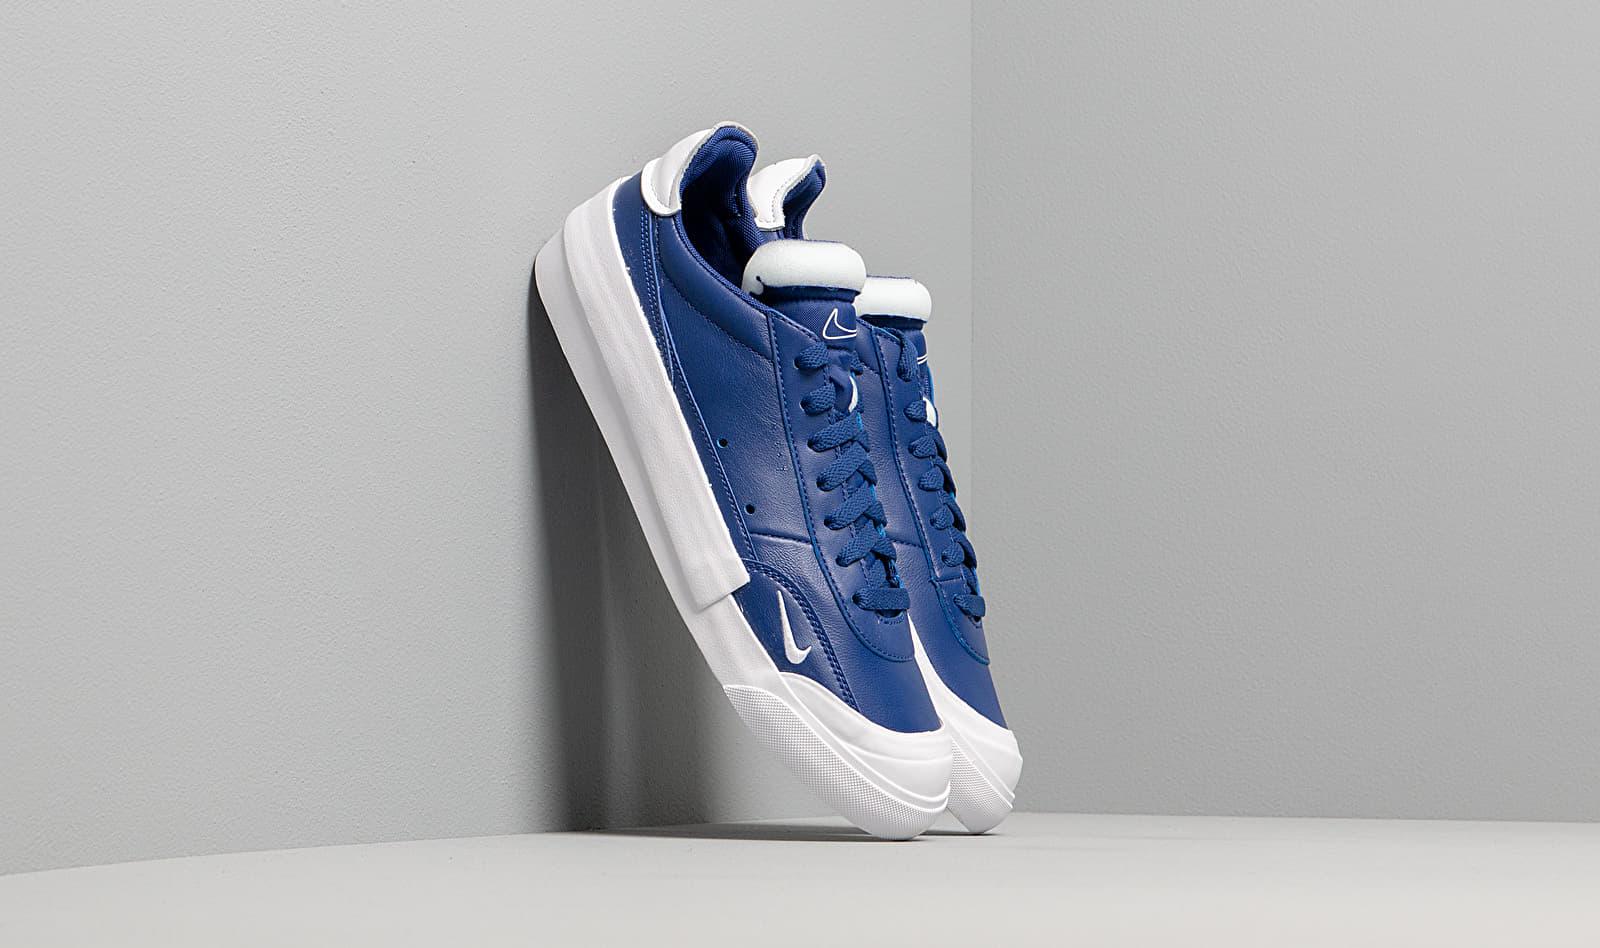 Nike Drop-Type Premium Deep Royal Blue/ White-Black CN6916-400